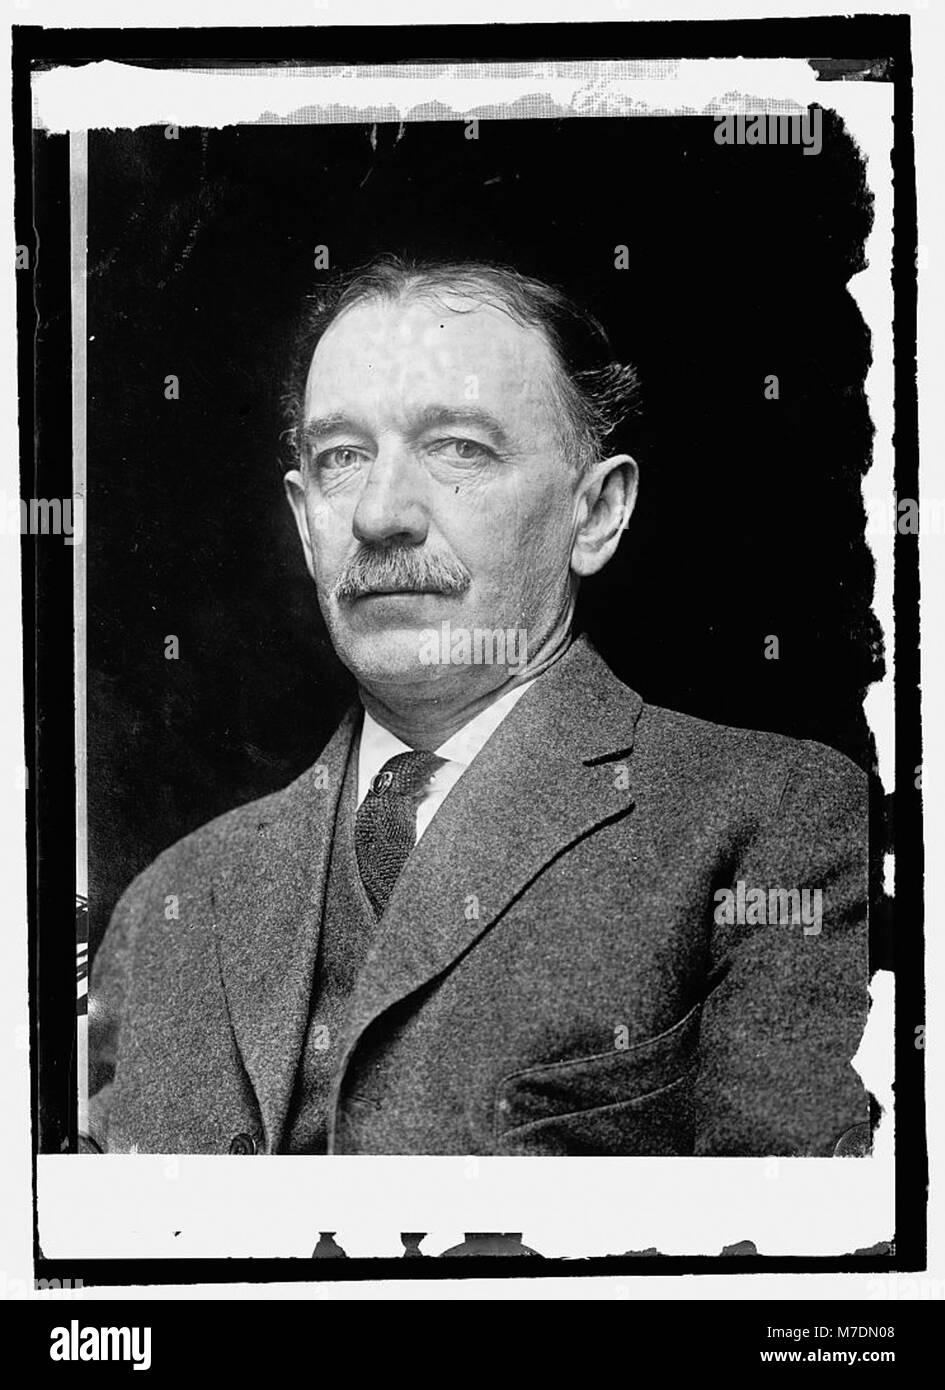 Herr de Lanay Gill, Büro Standort. Etymologie LCCN 2016821491 Stockbild